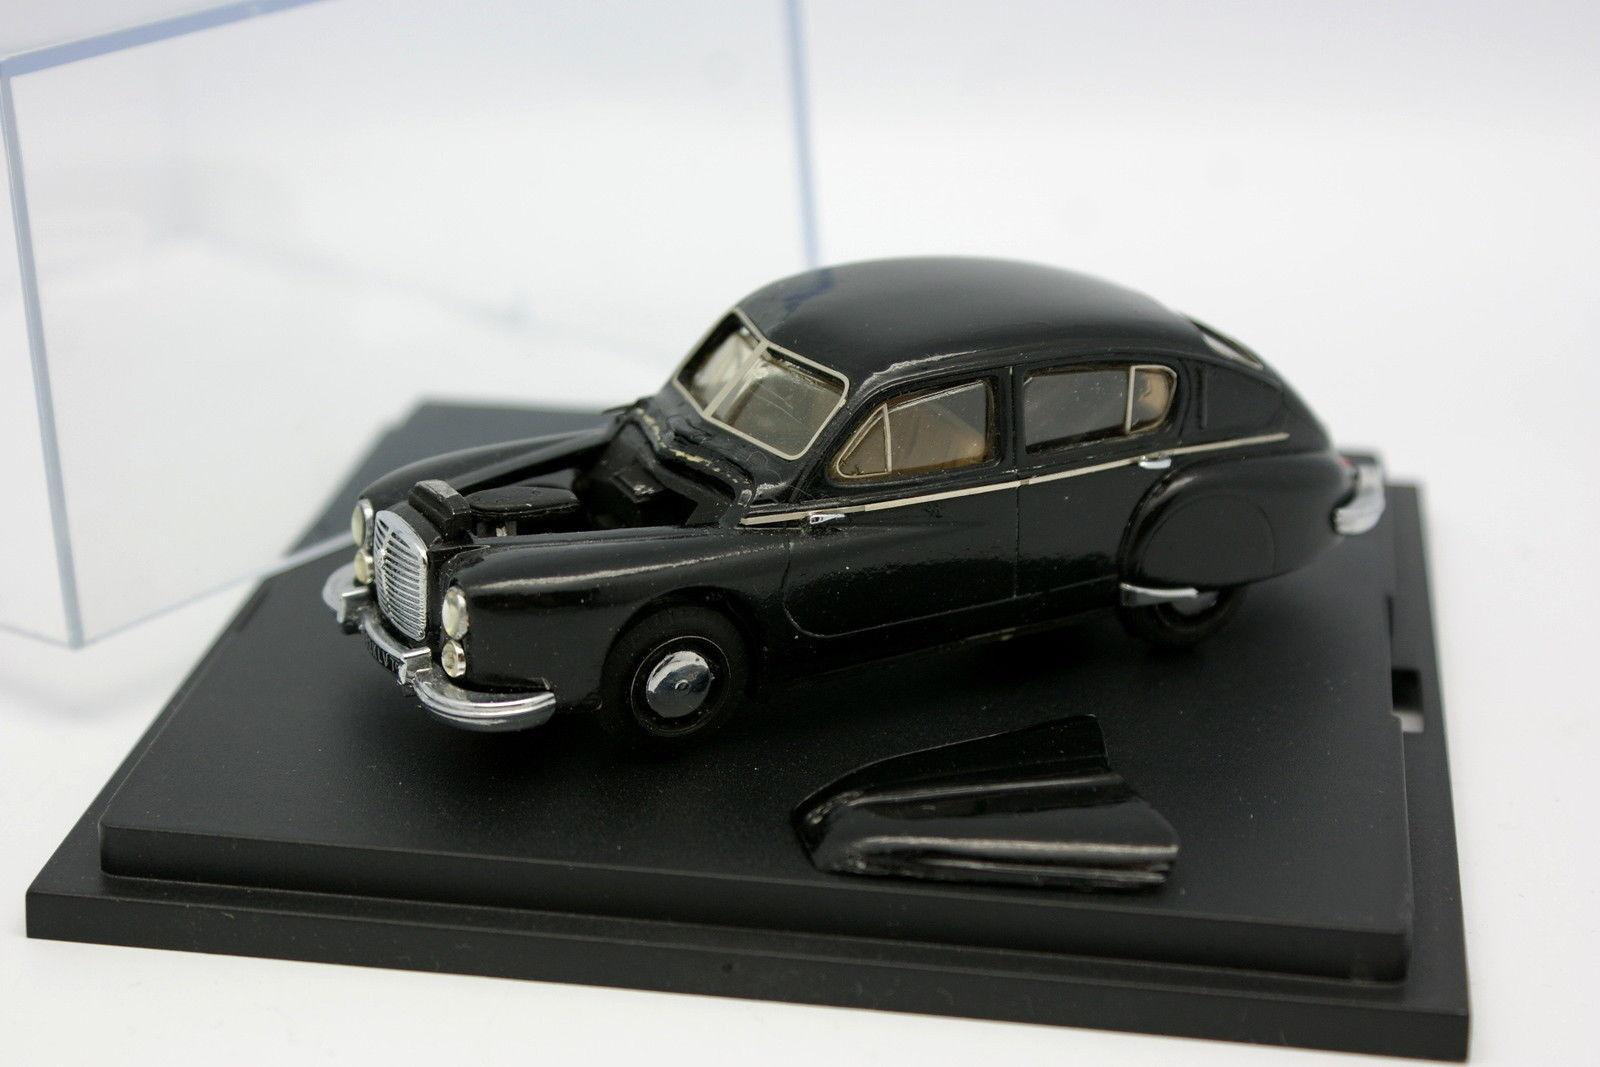 Ccc 1 43 - Hotchkiss Gregory 1952 black